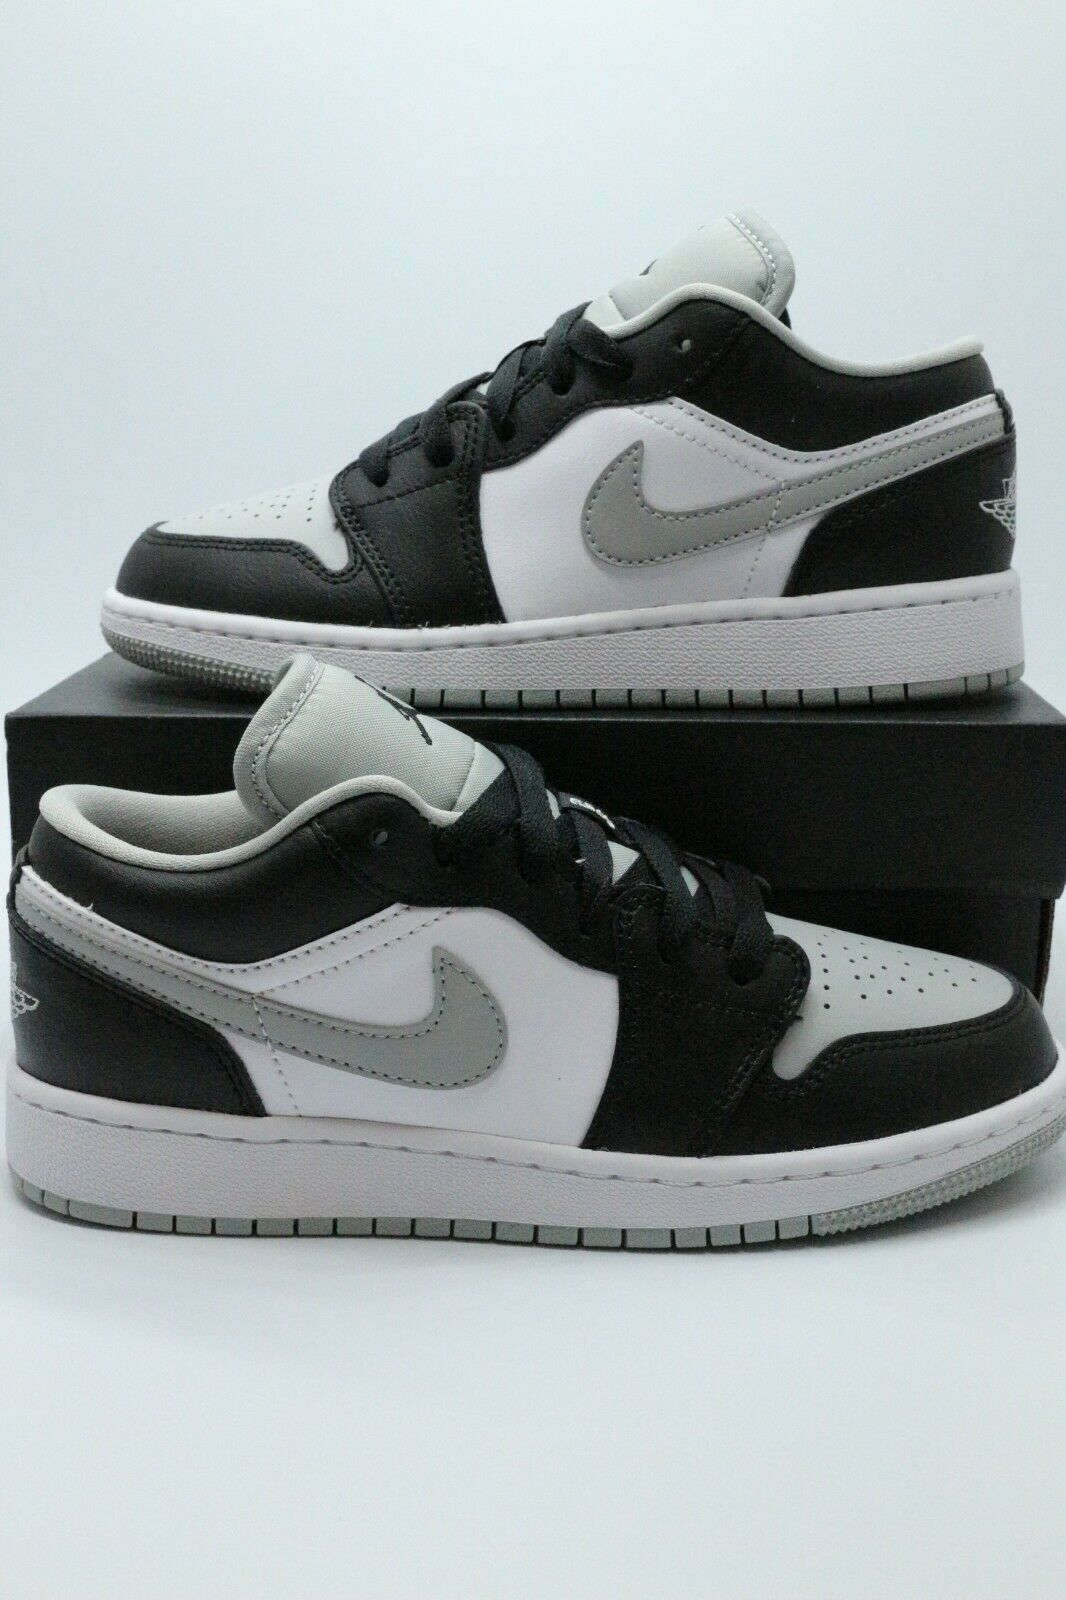 Nike Air Jordan Retro 1 Low Light Smoke Grey Black 553558-039 Sz ...